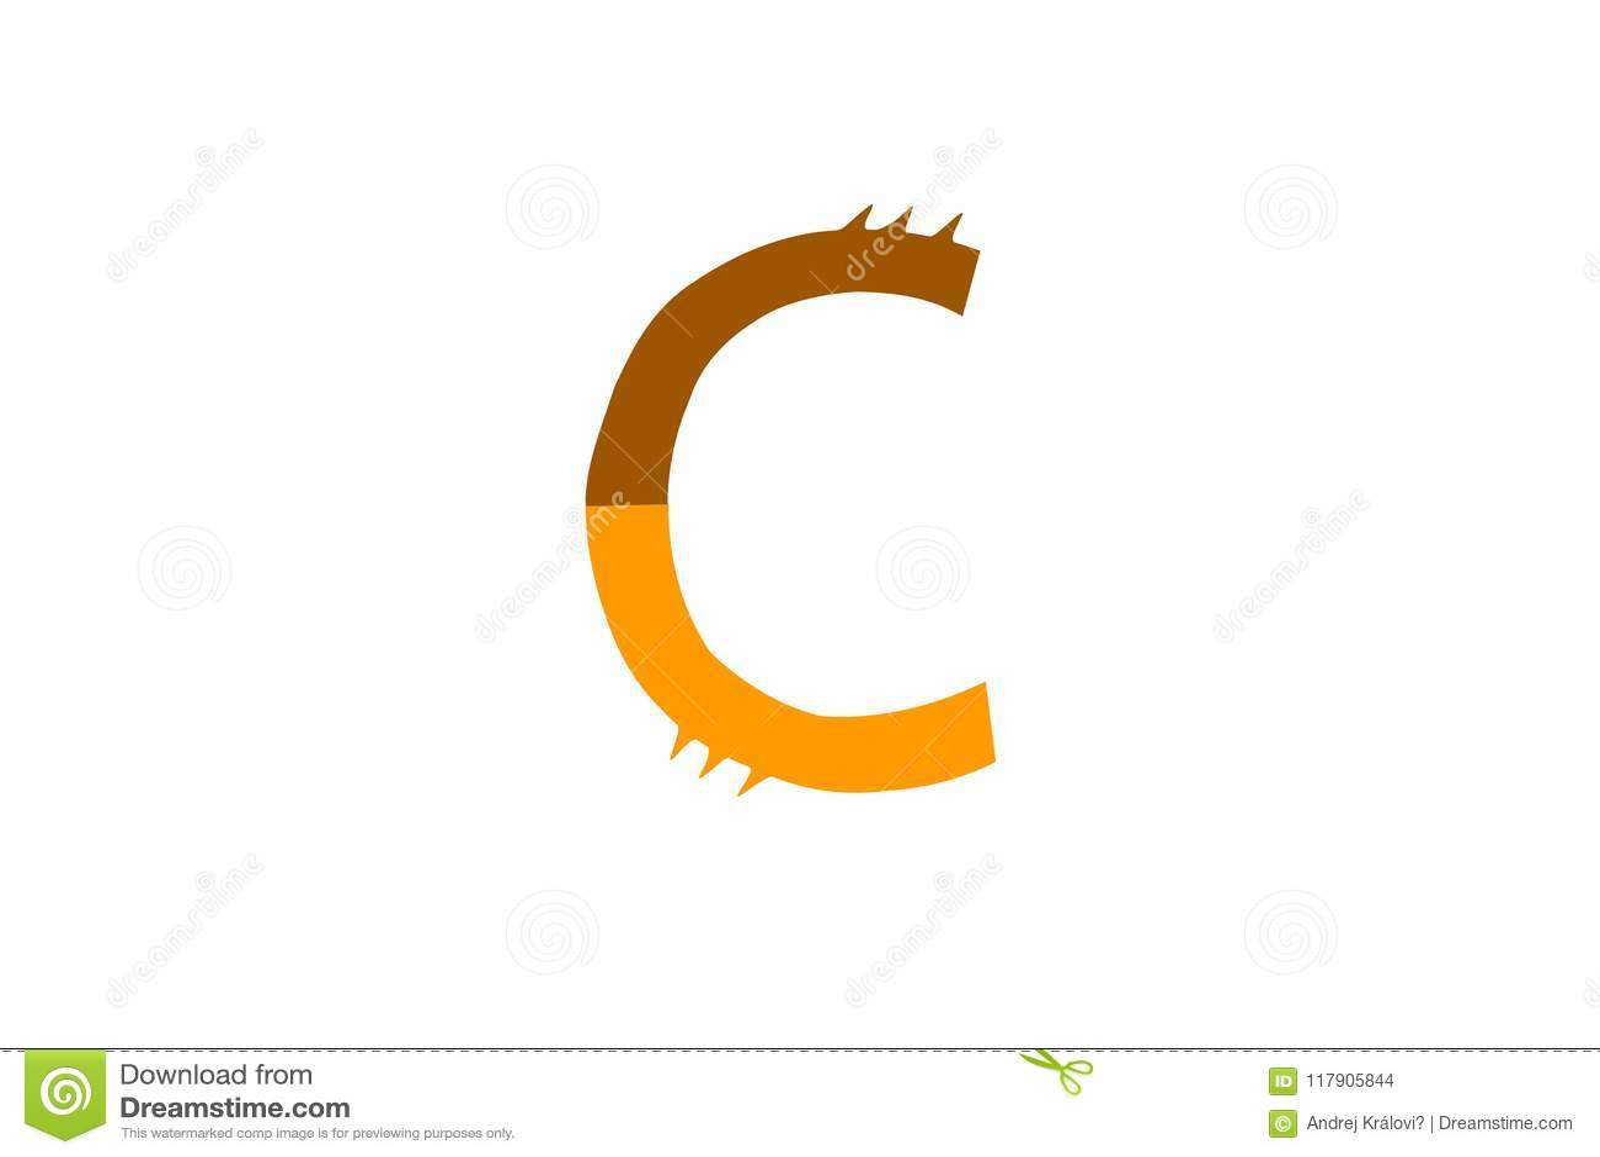 Letter Of Alphabet C Cog Design On White Backdrop Stock Vector